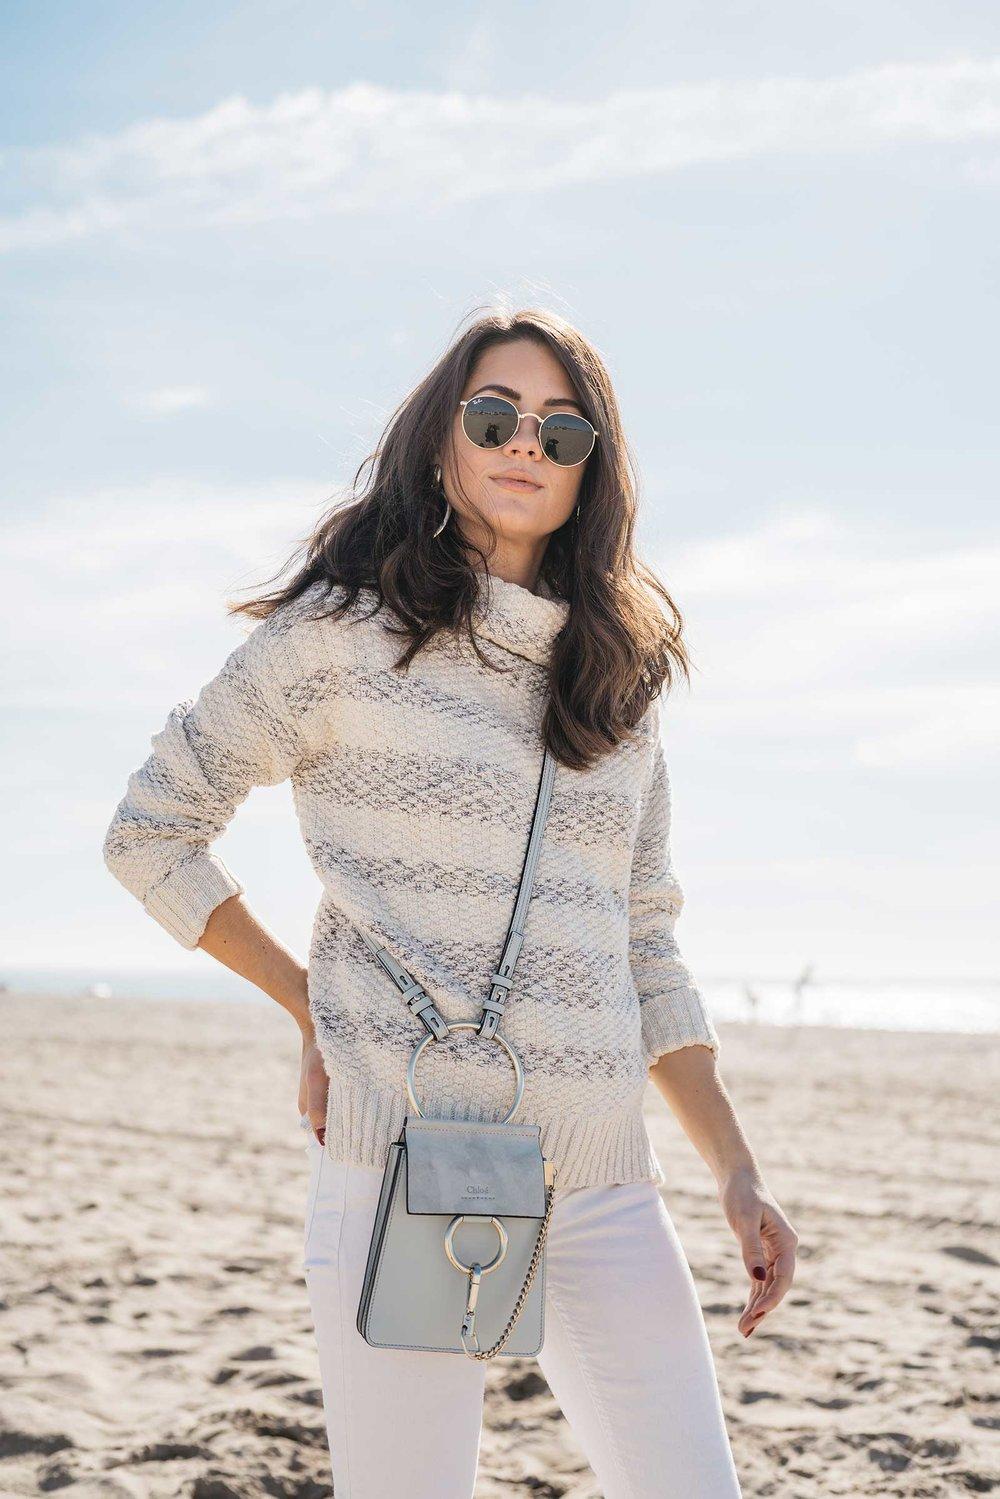 O'Neill-Livie-Striped-Mock-Neck-Sweater-Chloe-Faye-Small-Leather-Bracelet-Bag-Ray-Ban-53mm-Retro-Sunglasses-3.jpg